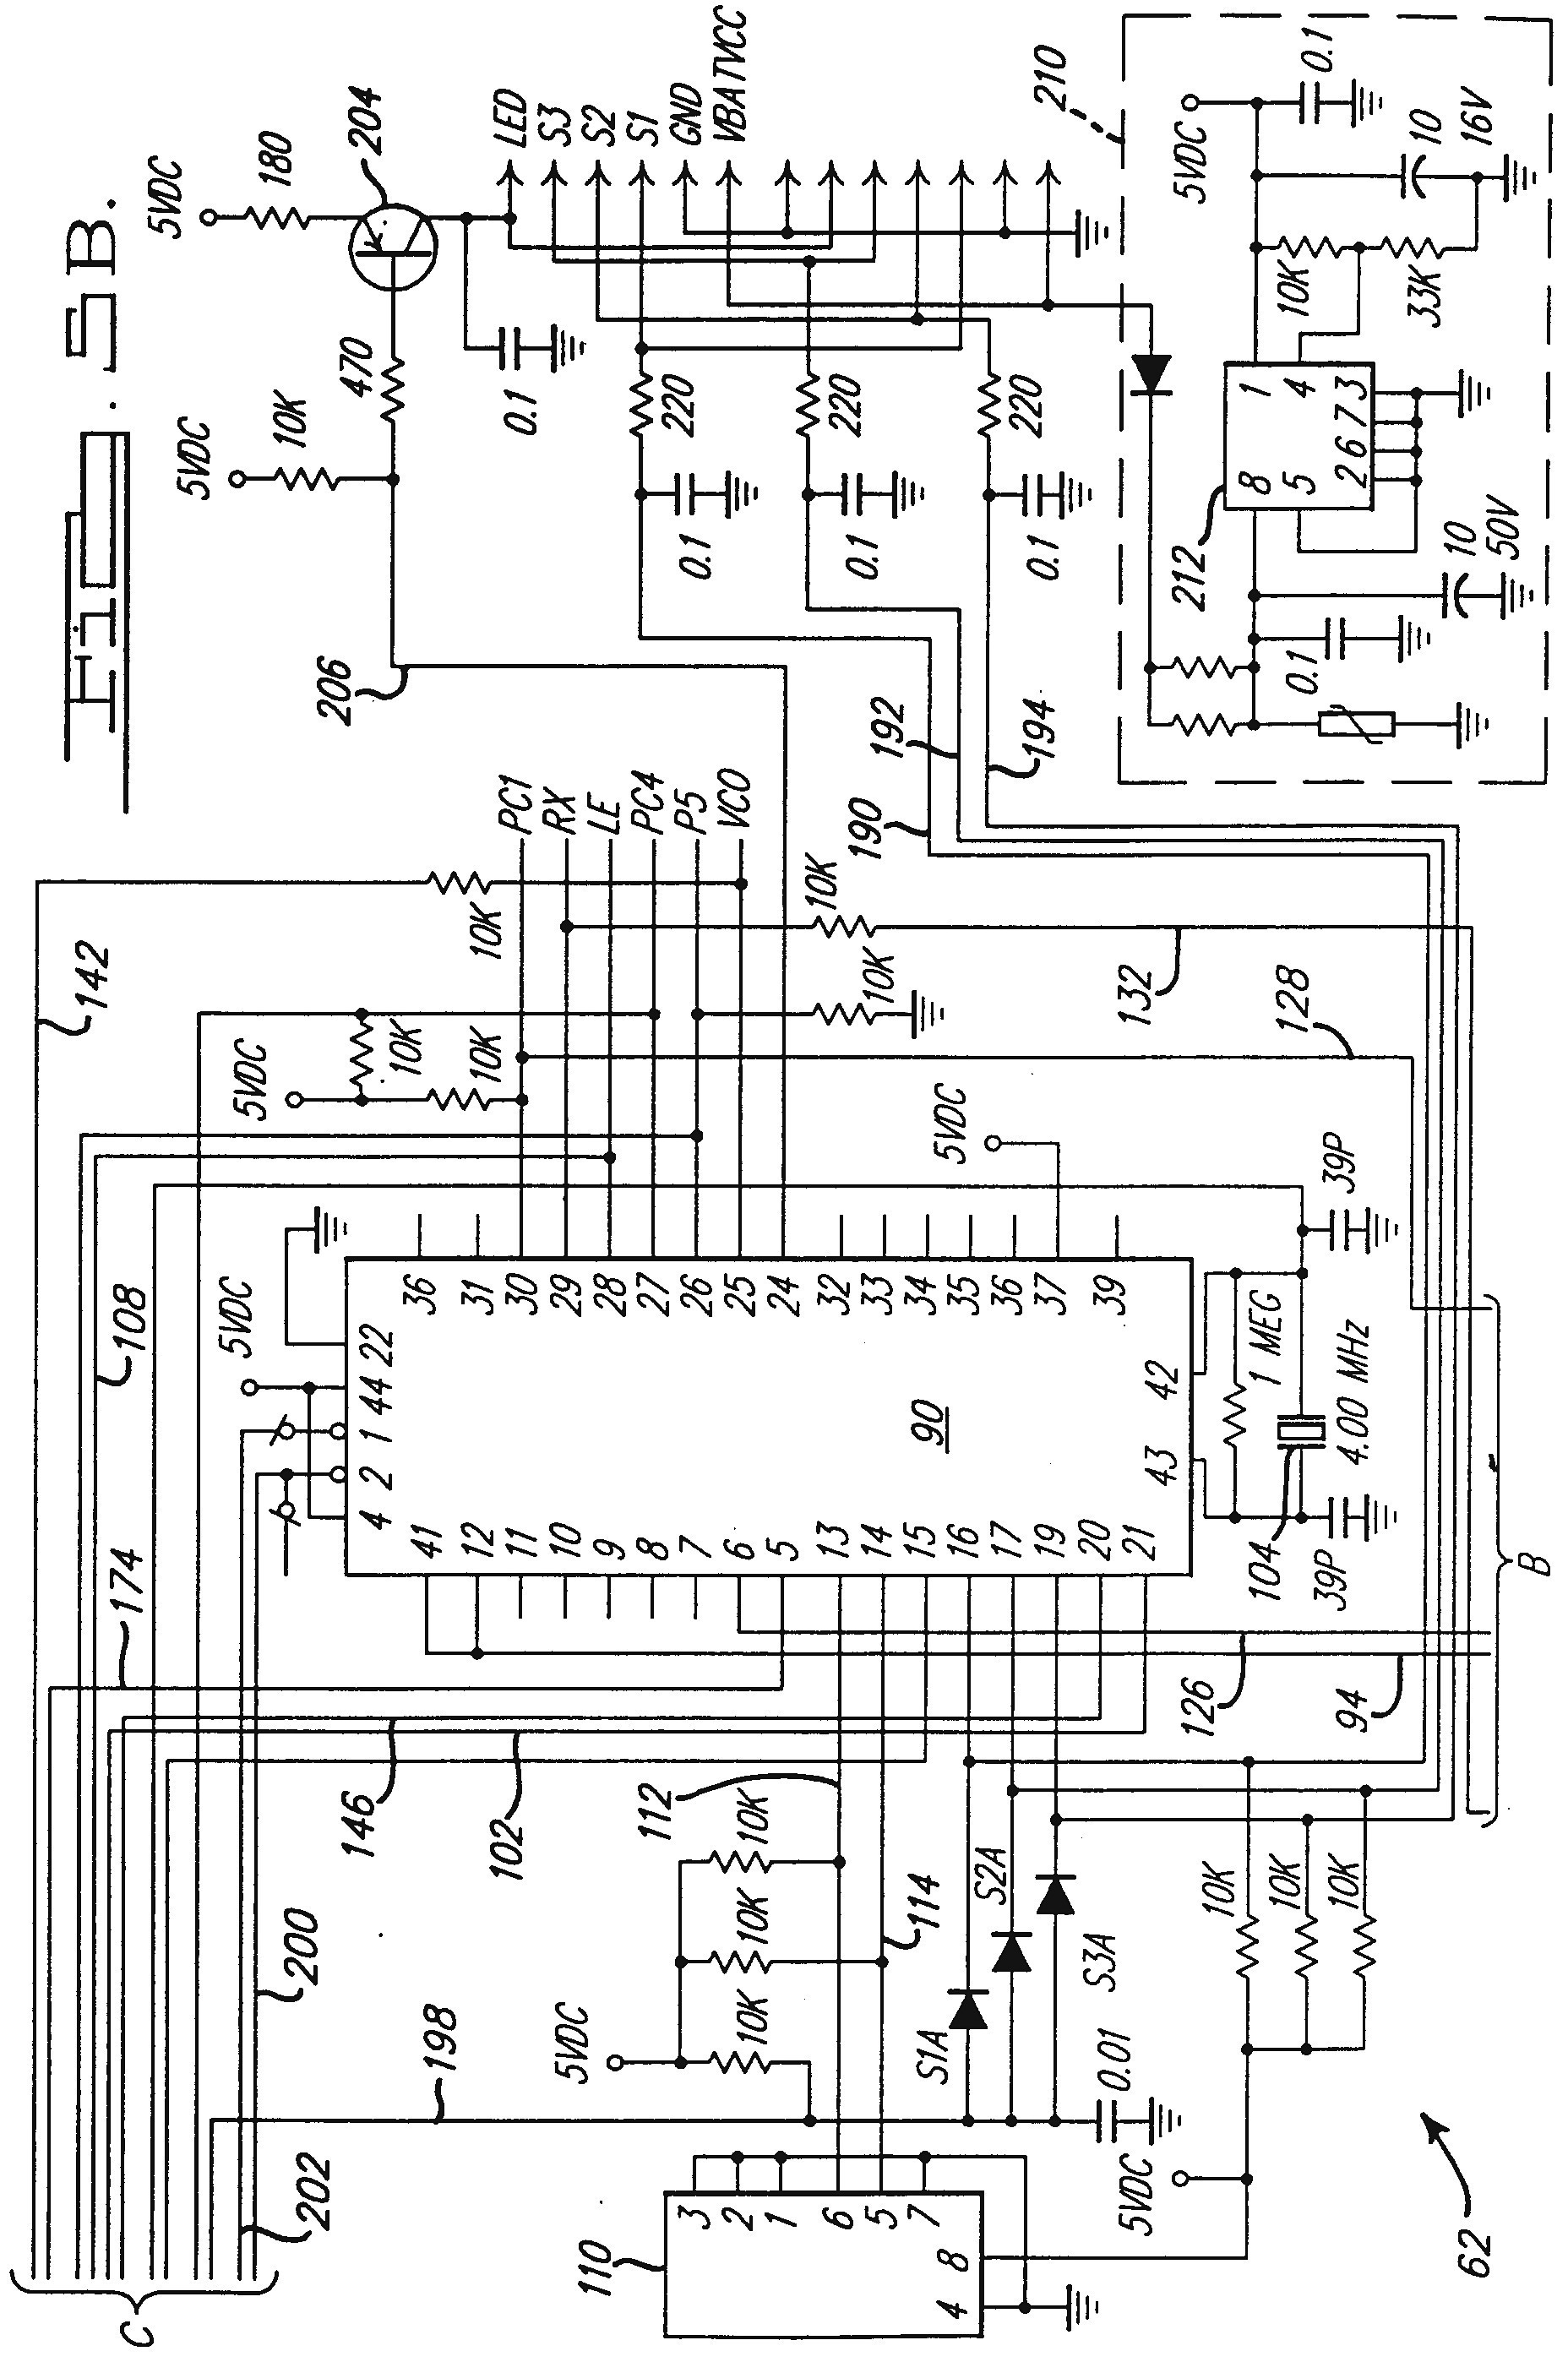 professional wiring diagrams wiring diagram broan wiring diagram liftmaster wiring diagram wiring diagramliftmaster commercial wiring diagram 2 7 web berei de \\\\u2022liftmaster